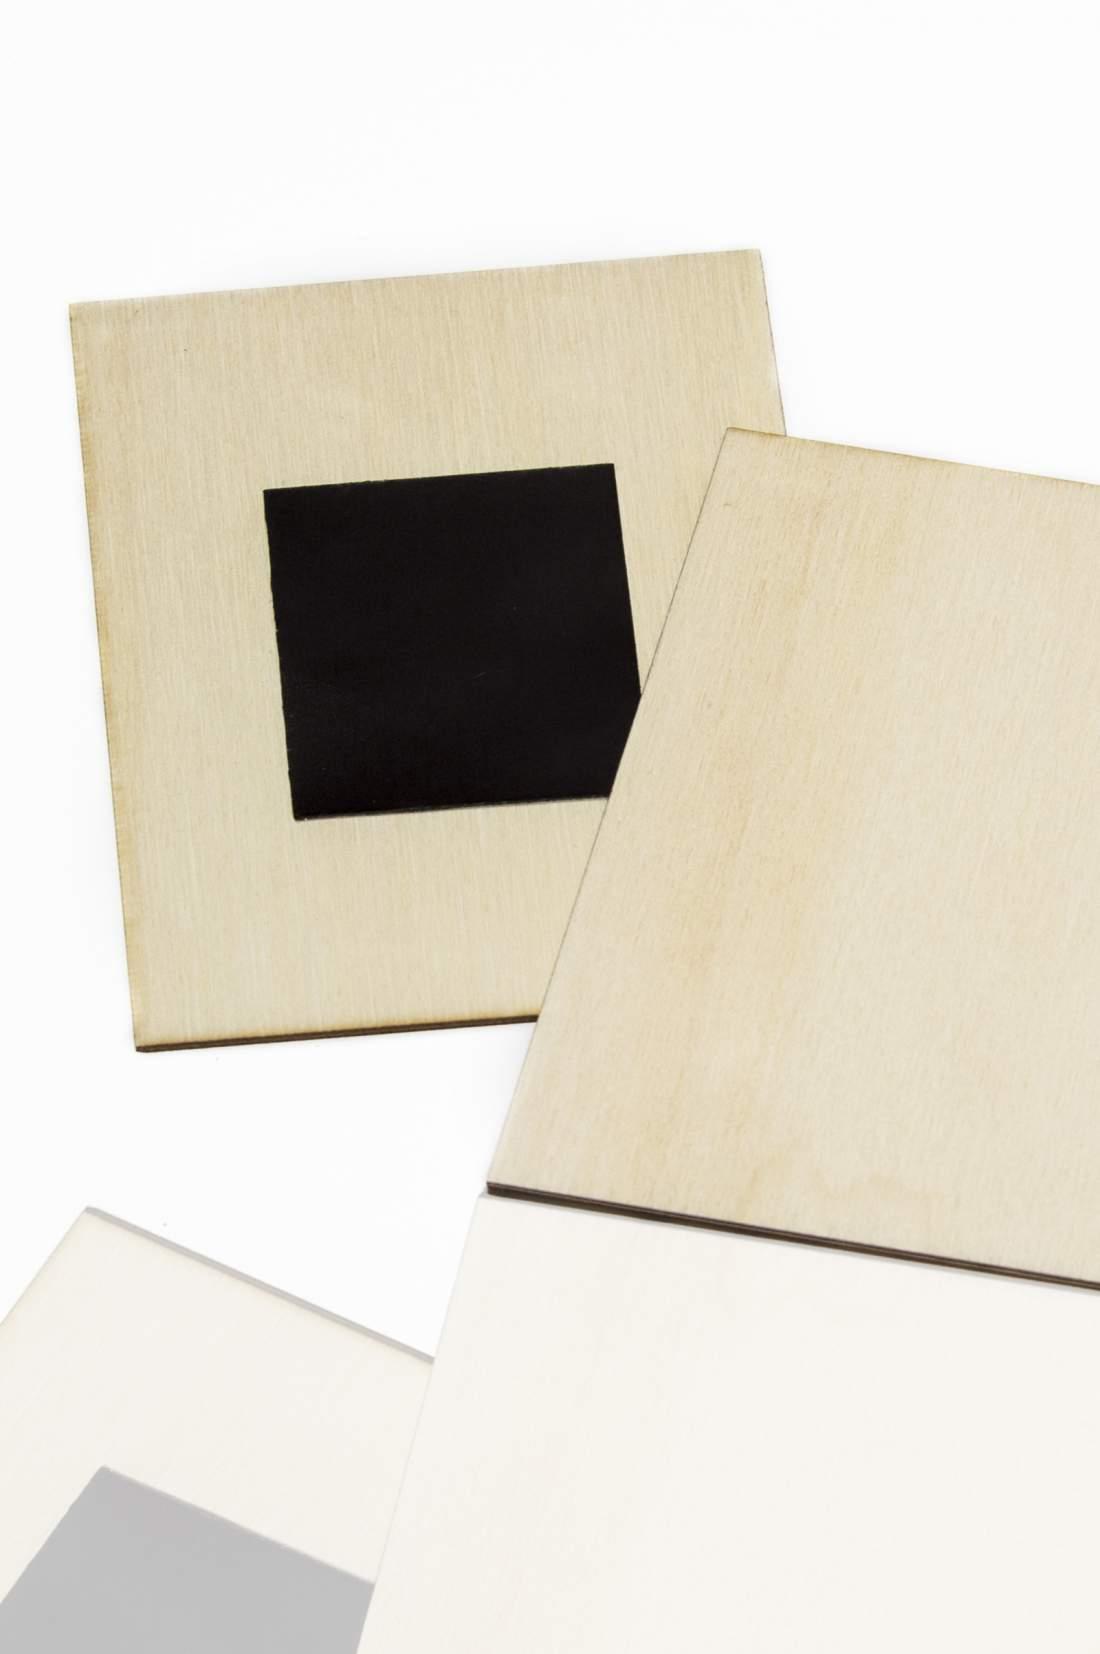 102.2 Drevená magnetka na chladničku – základný materiál 57x57mm